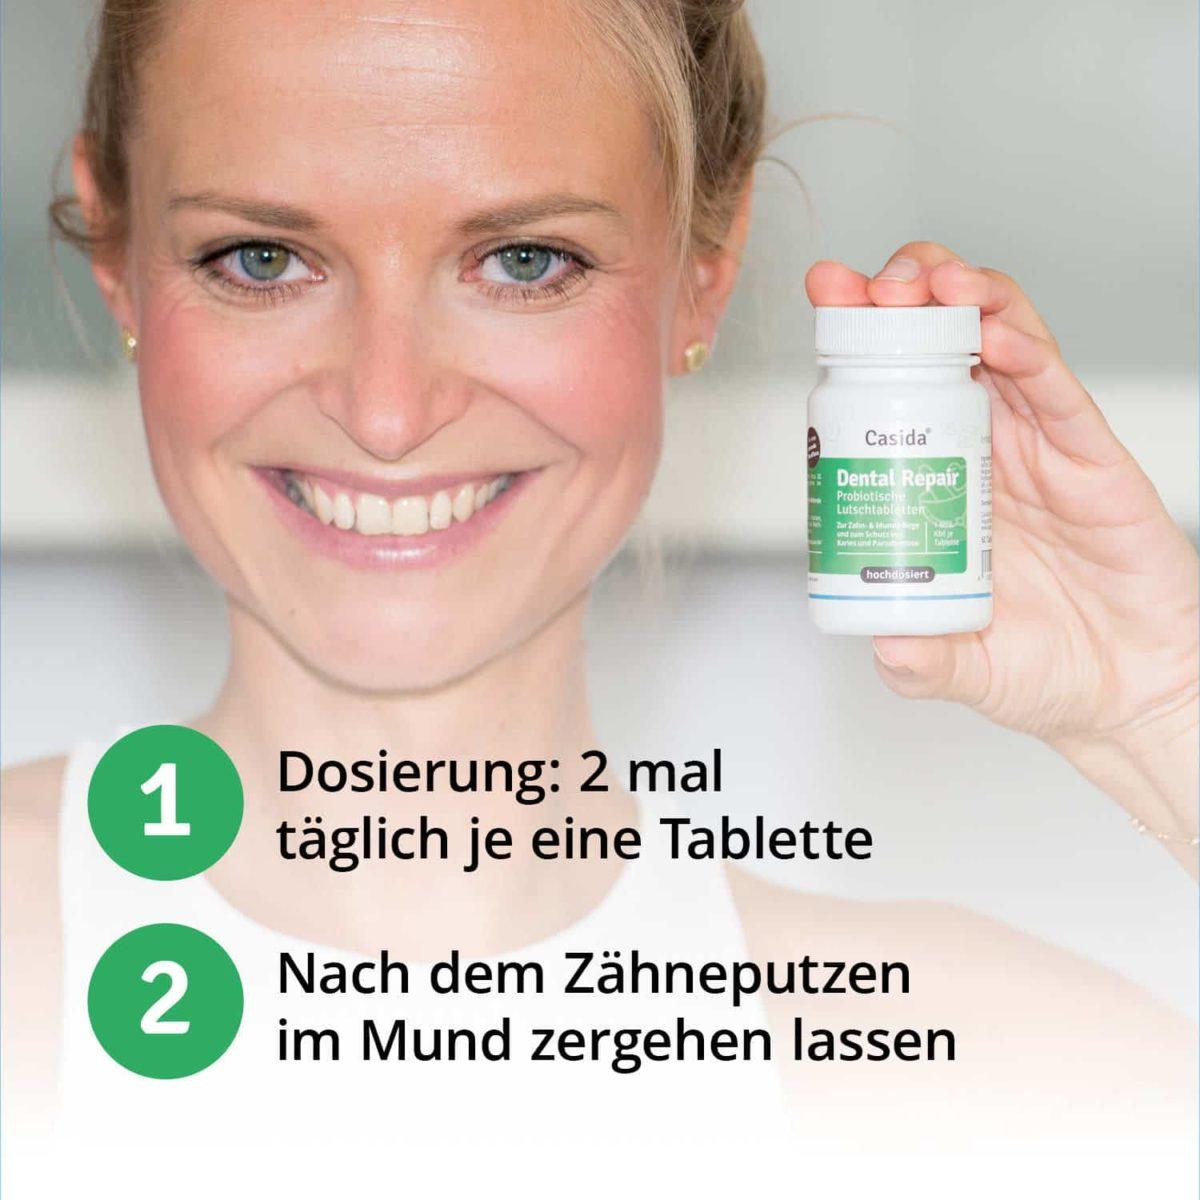 Casida Dental Repair Lutschtabletten – 60 Stk. 14401553 PZN Apotheke Karies Zahnpflege Parodontose6